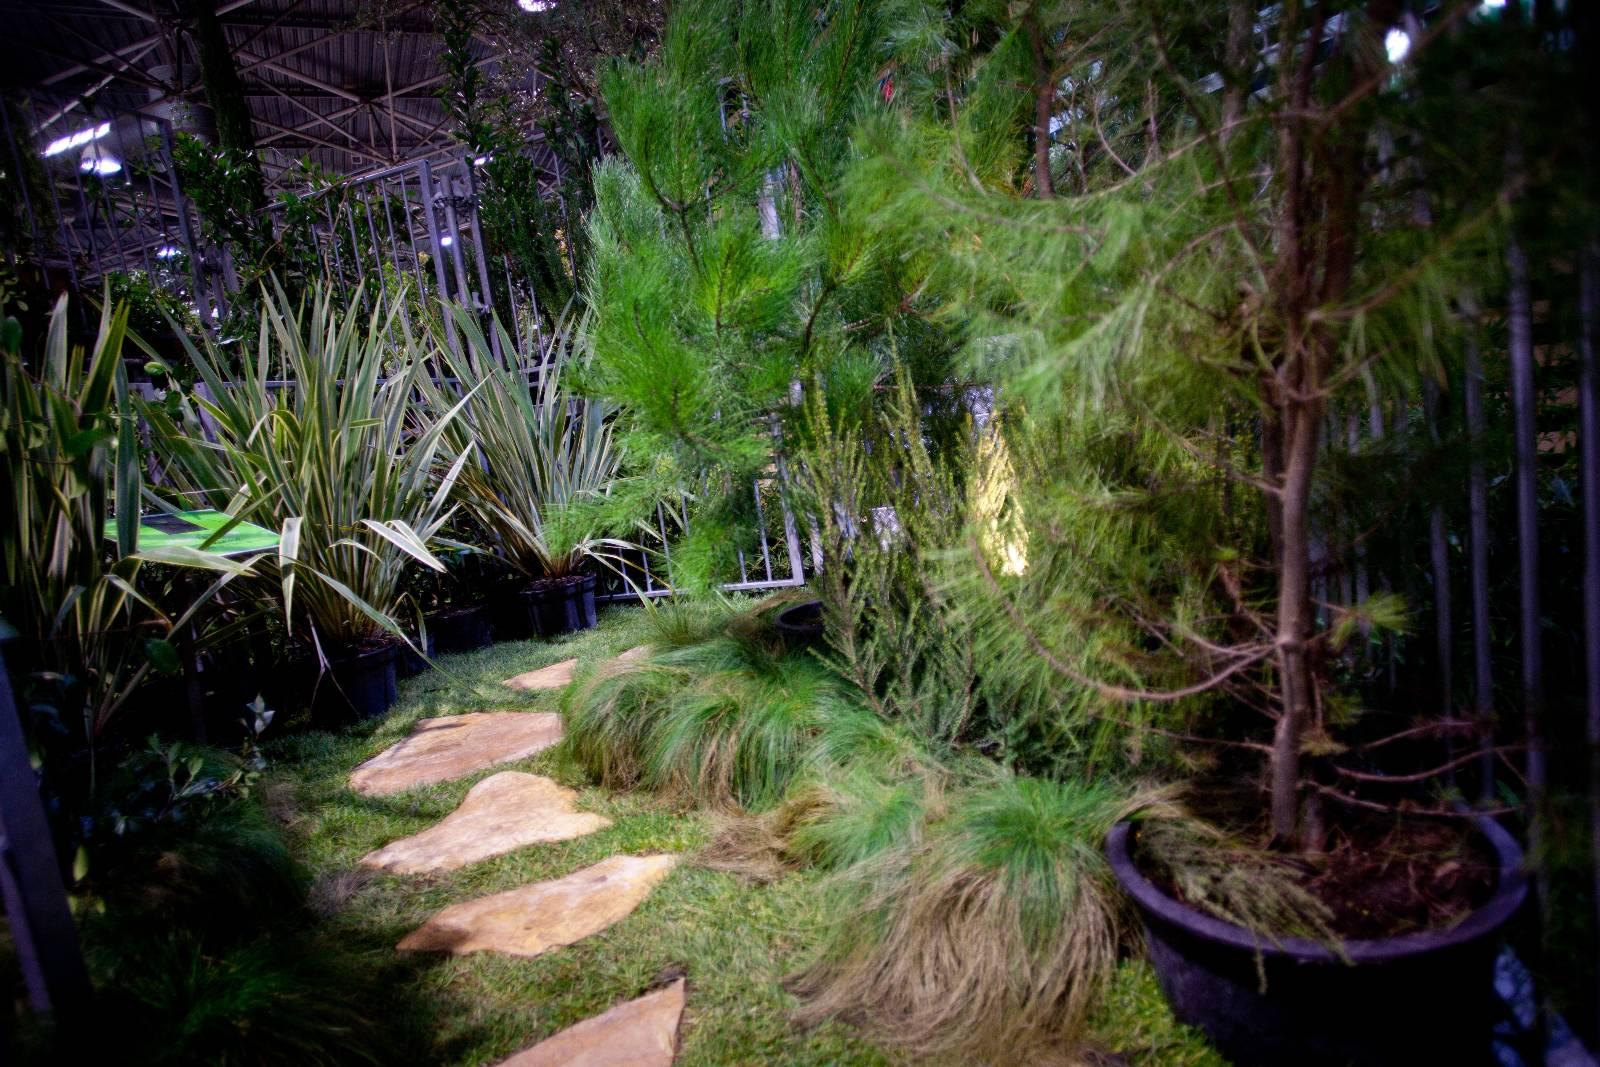 Carr des jardiniers l 39 esprit des jardins for Jardins de jardiniers